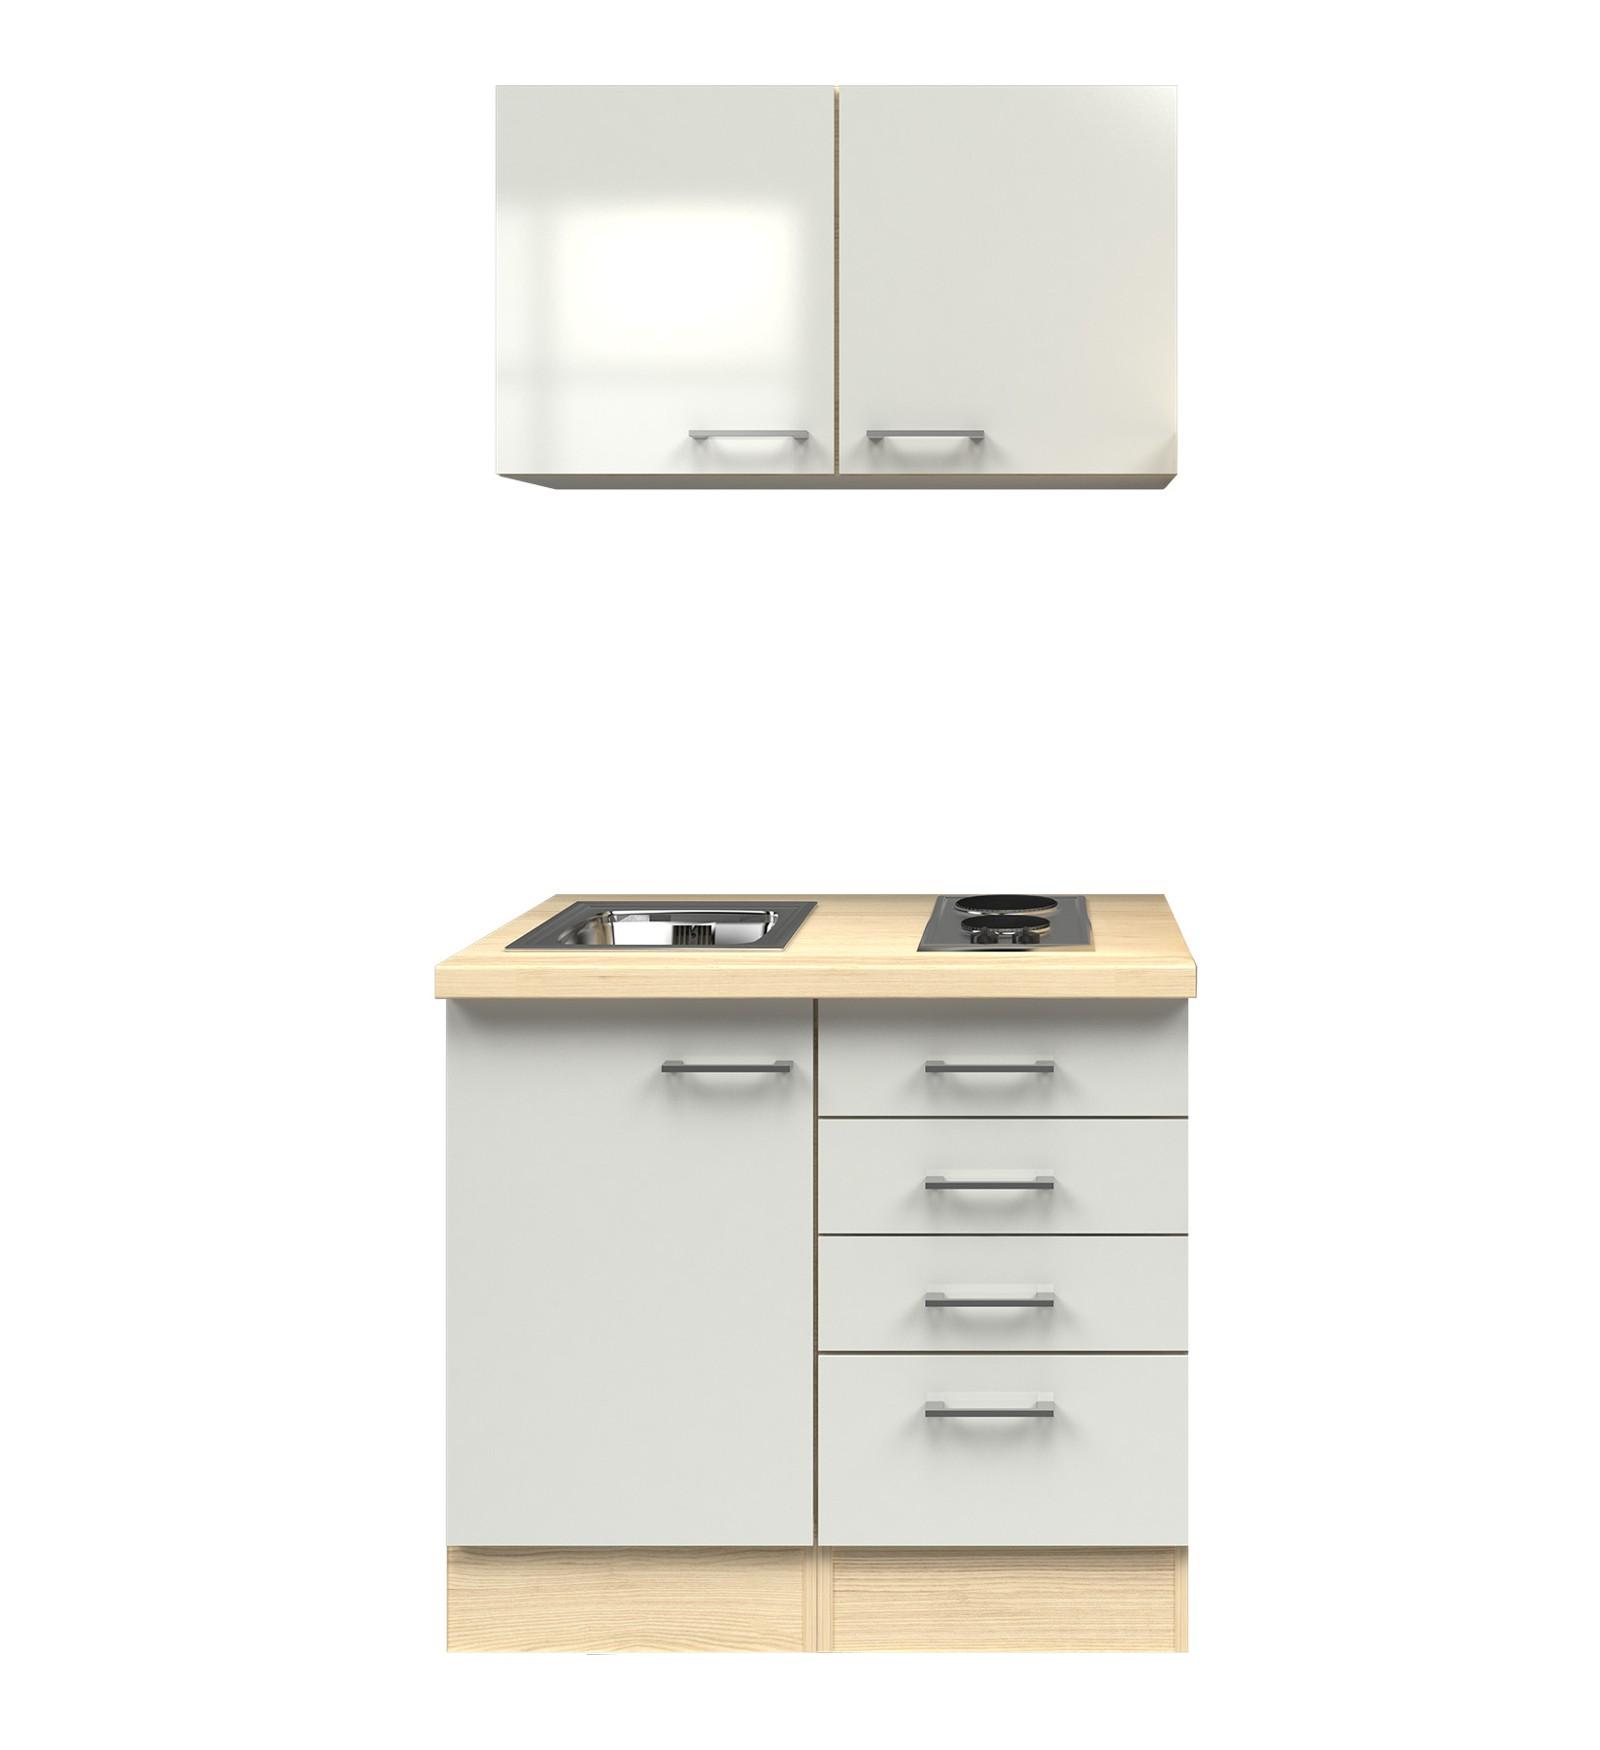 minik che florenz singlek che mit elektro kochfeld 100 cm. Black Bedroom Furniture Sets. Home Design Ideas